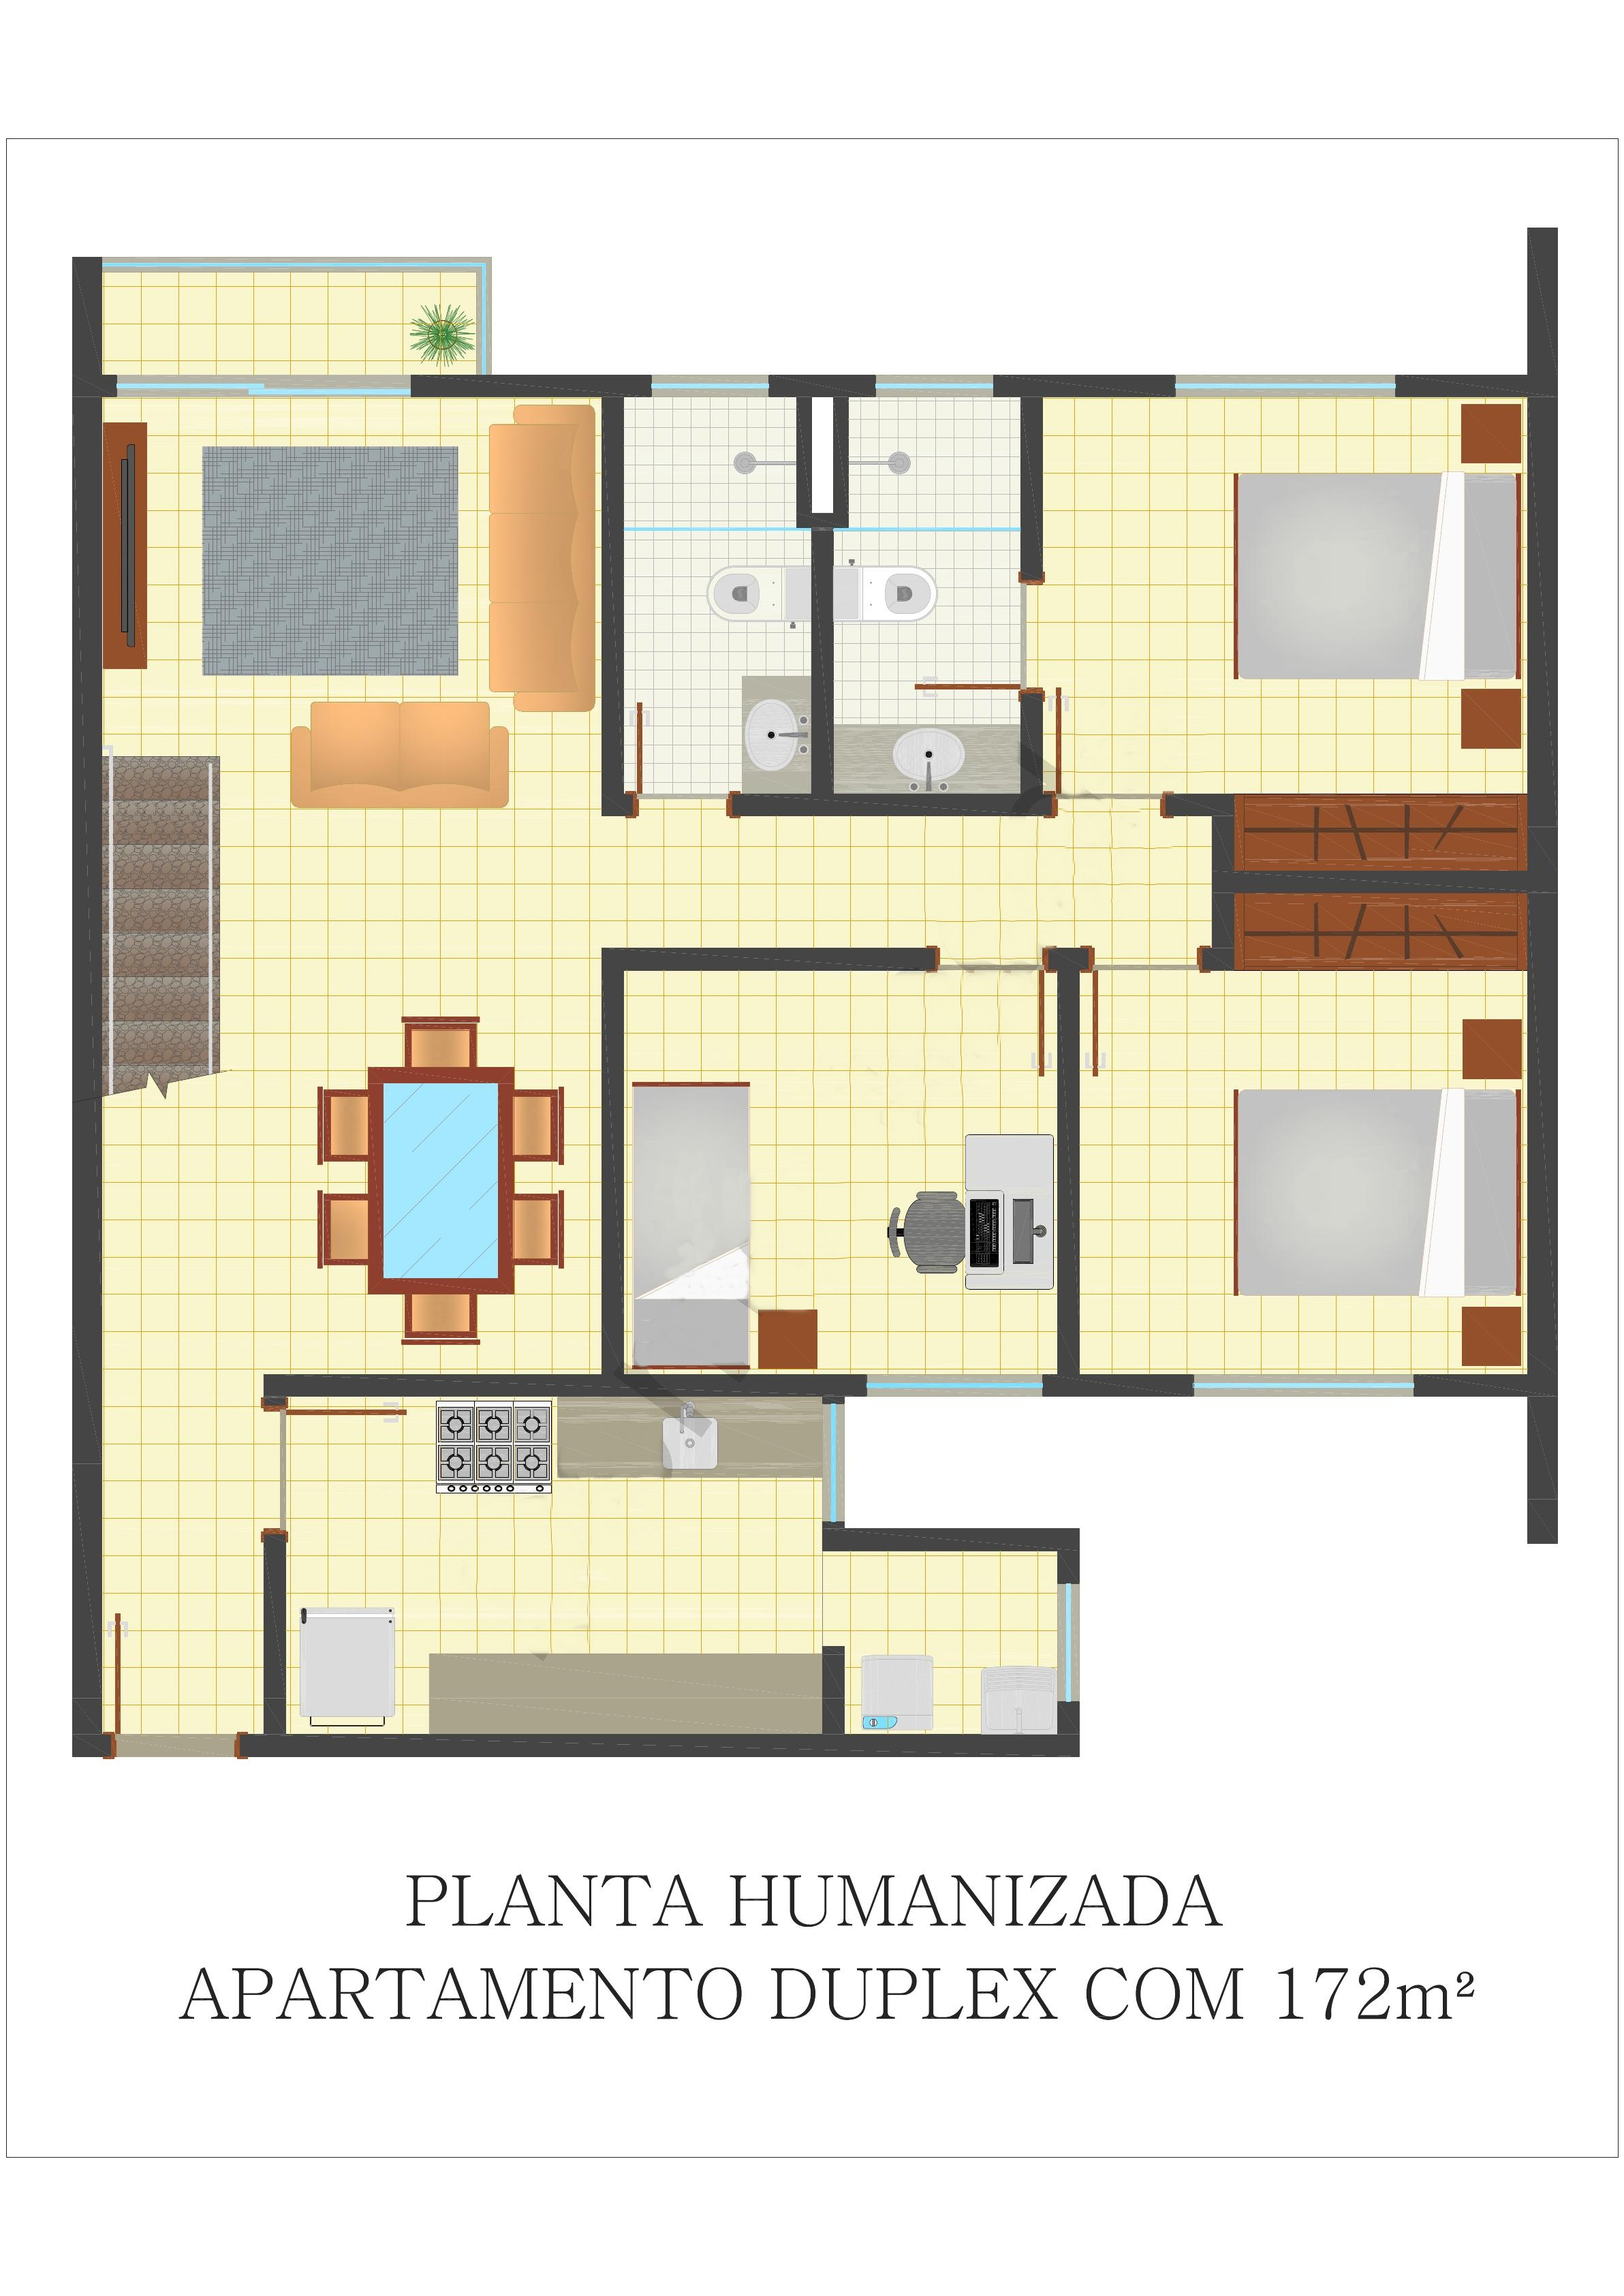 04 - Apt. Duplex 001.jpg